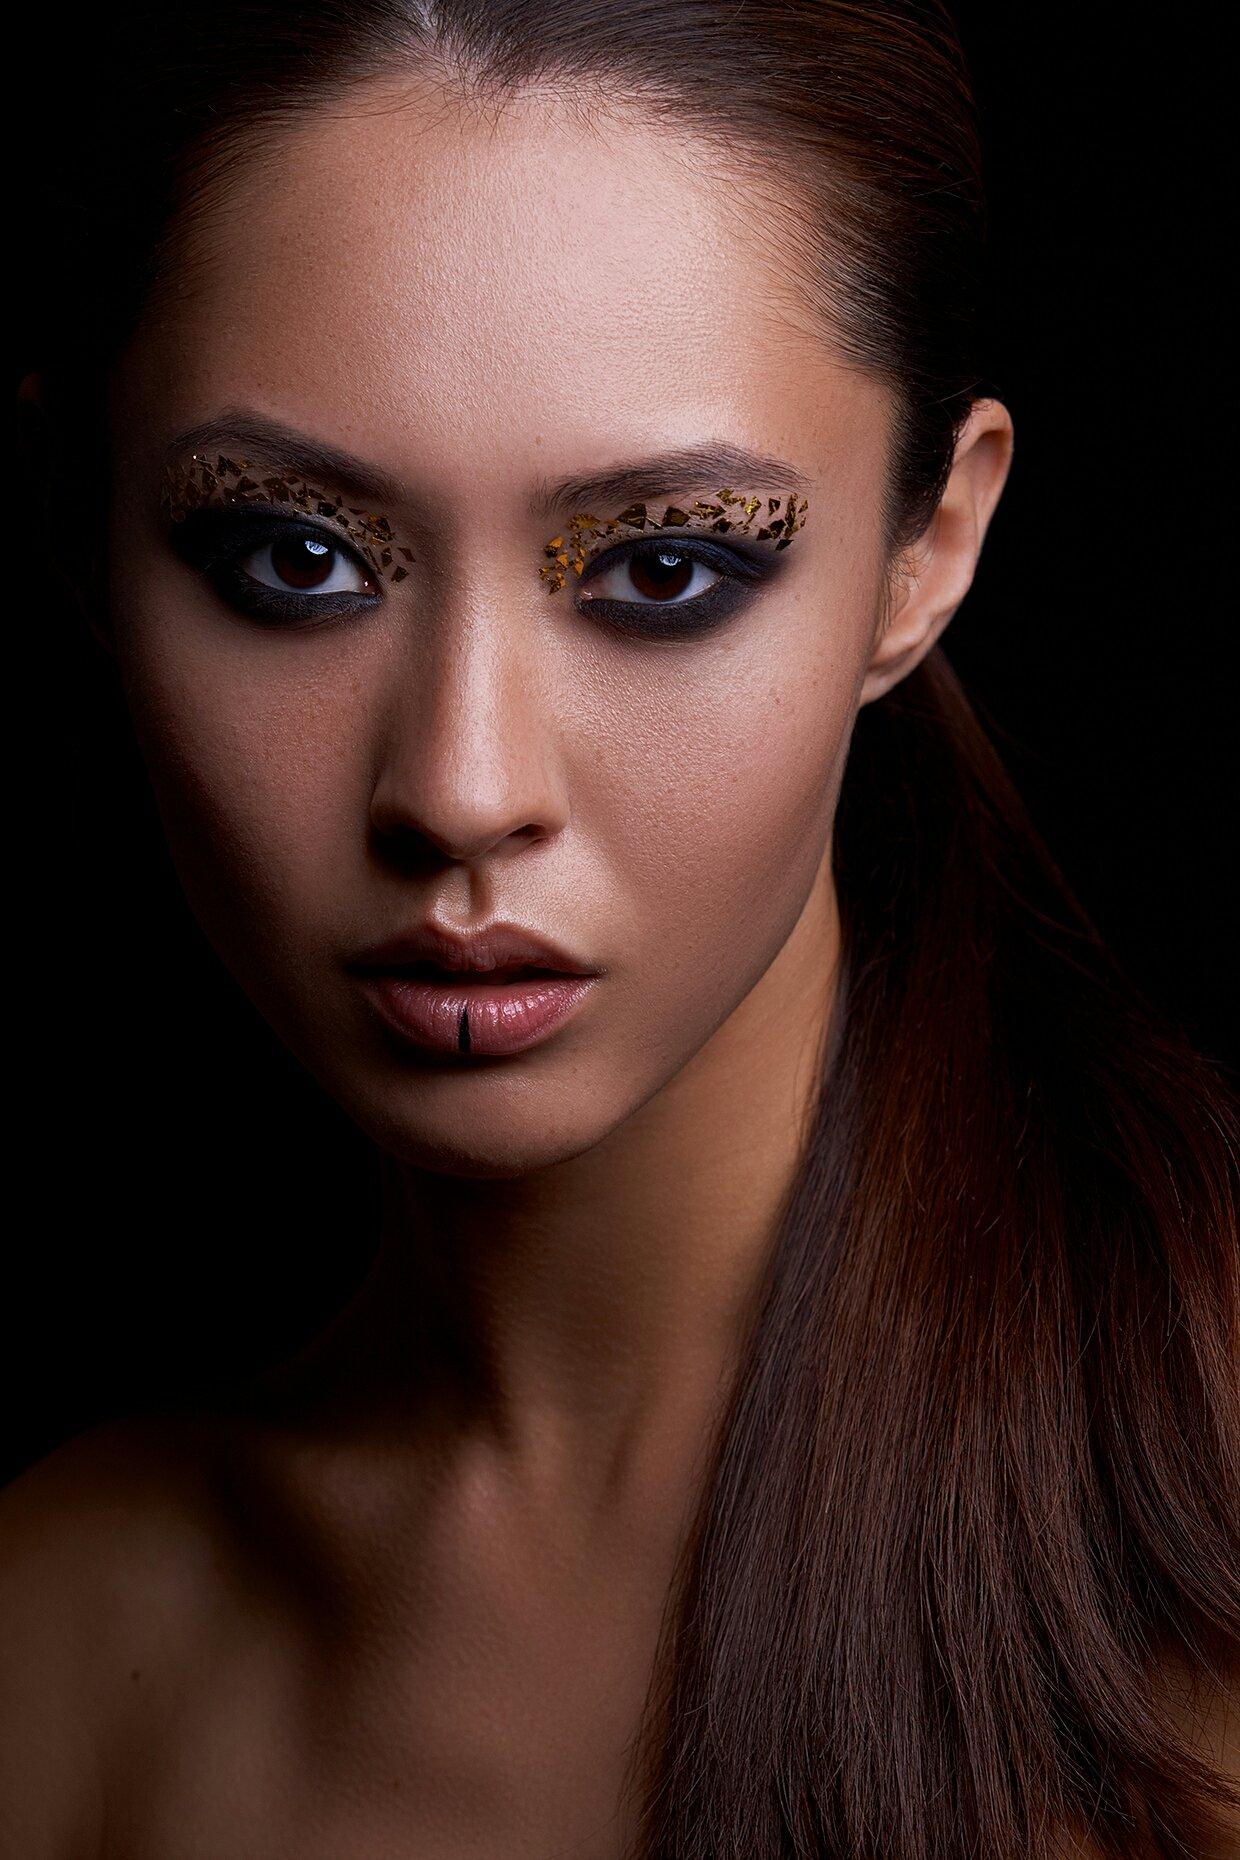 beauty, portrait, low key, asia, girl, dark, make up, бьюти, Наташа Высоцкая